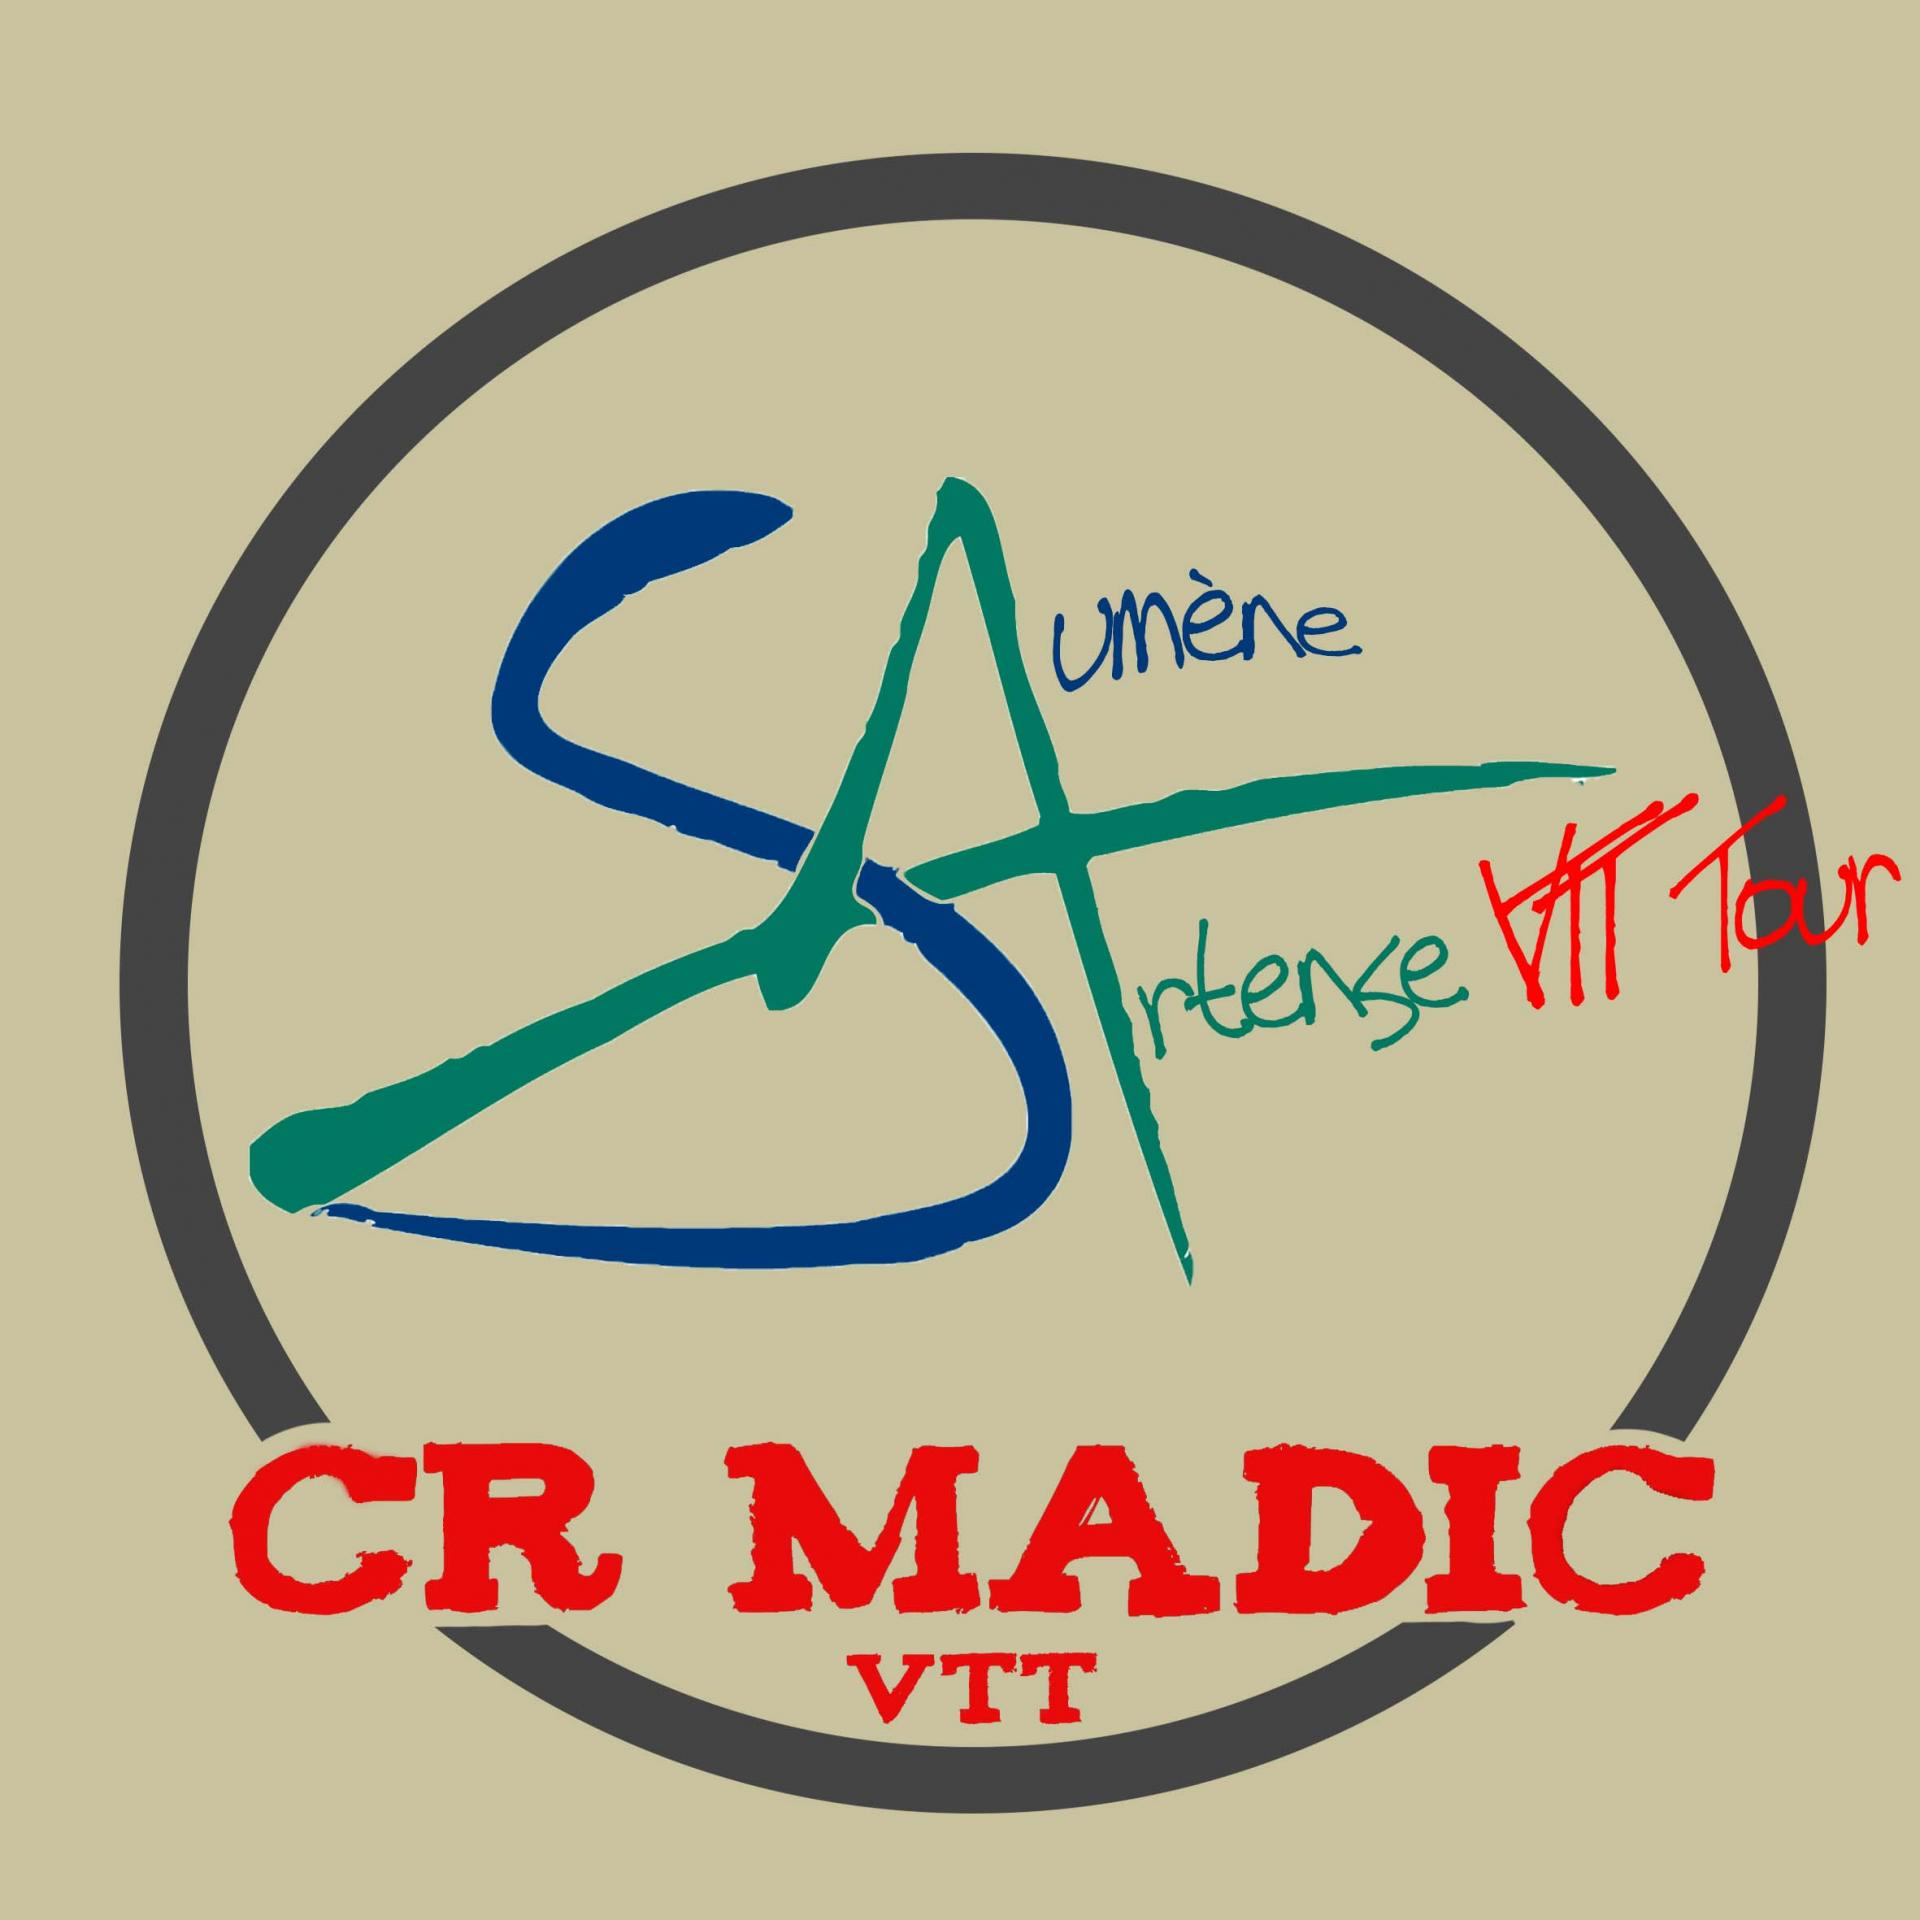 Cr madic savtt tour fond web